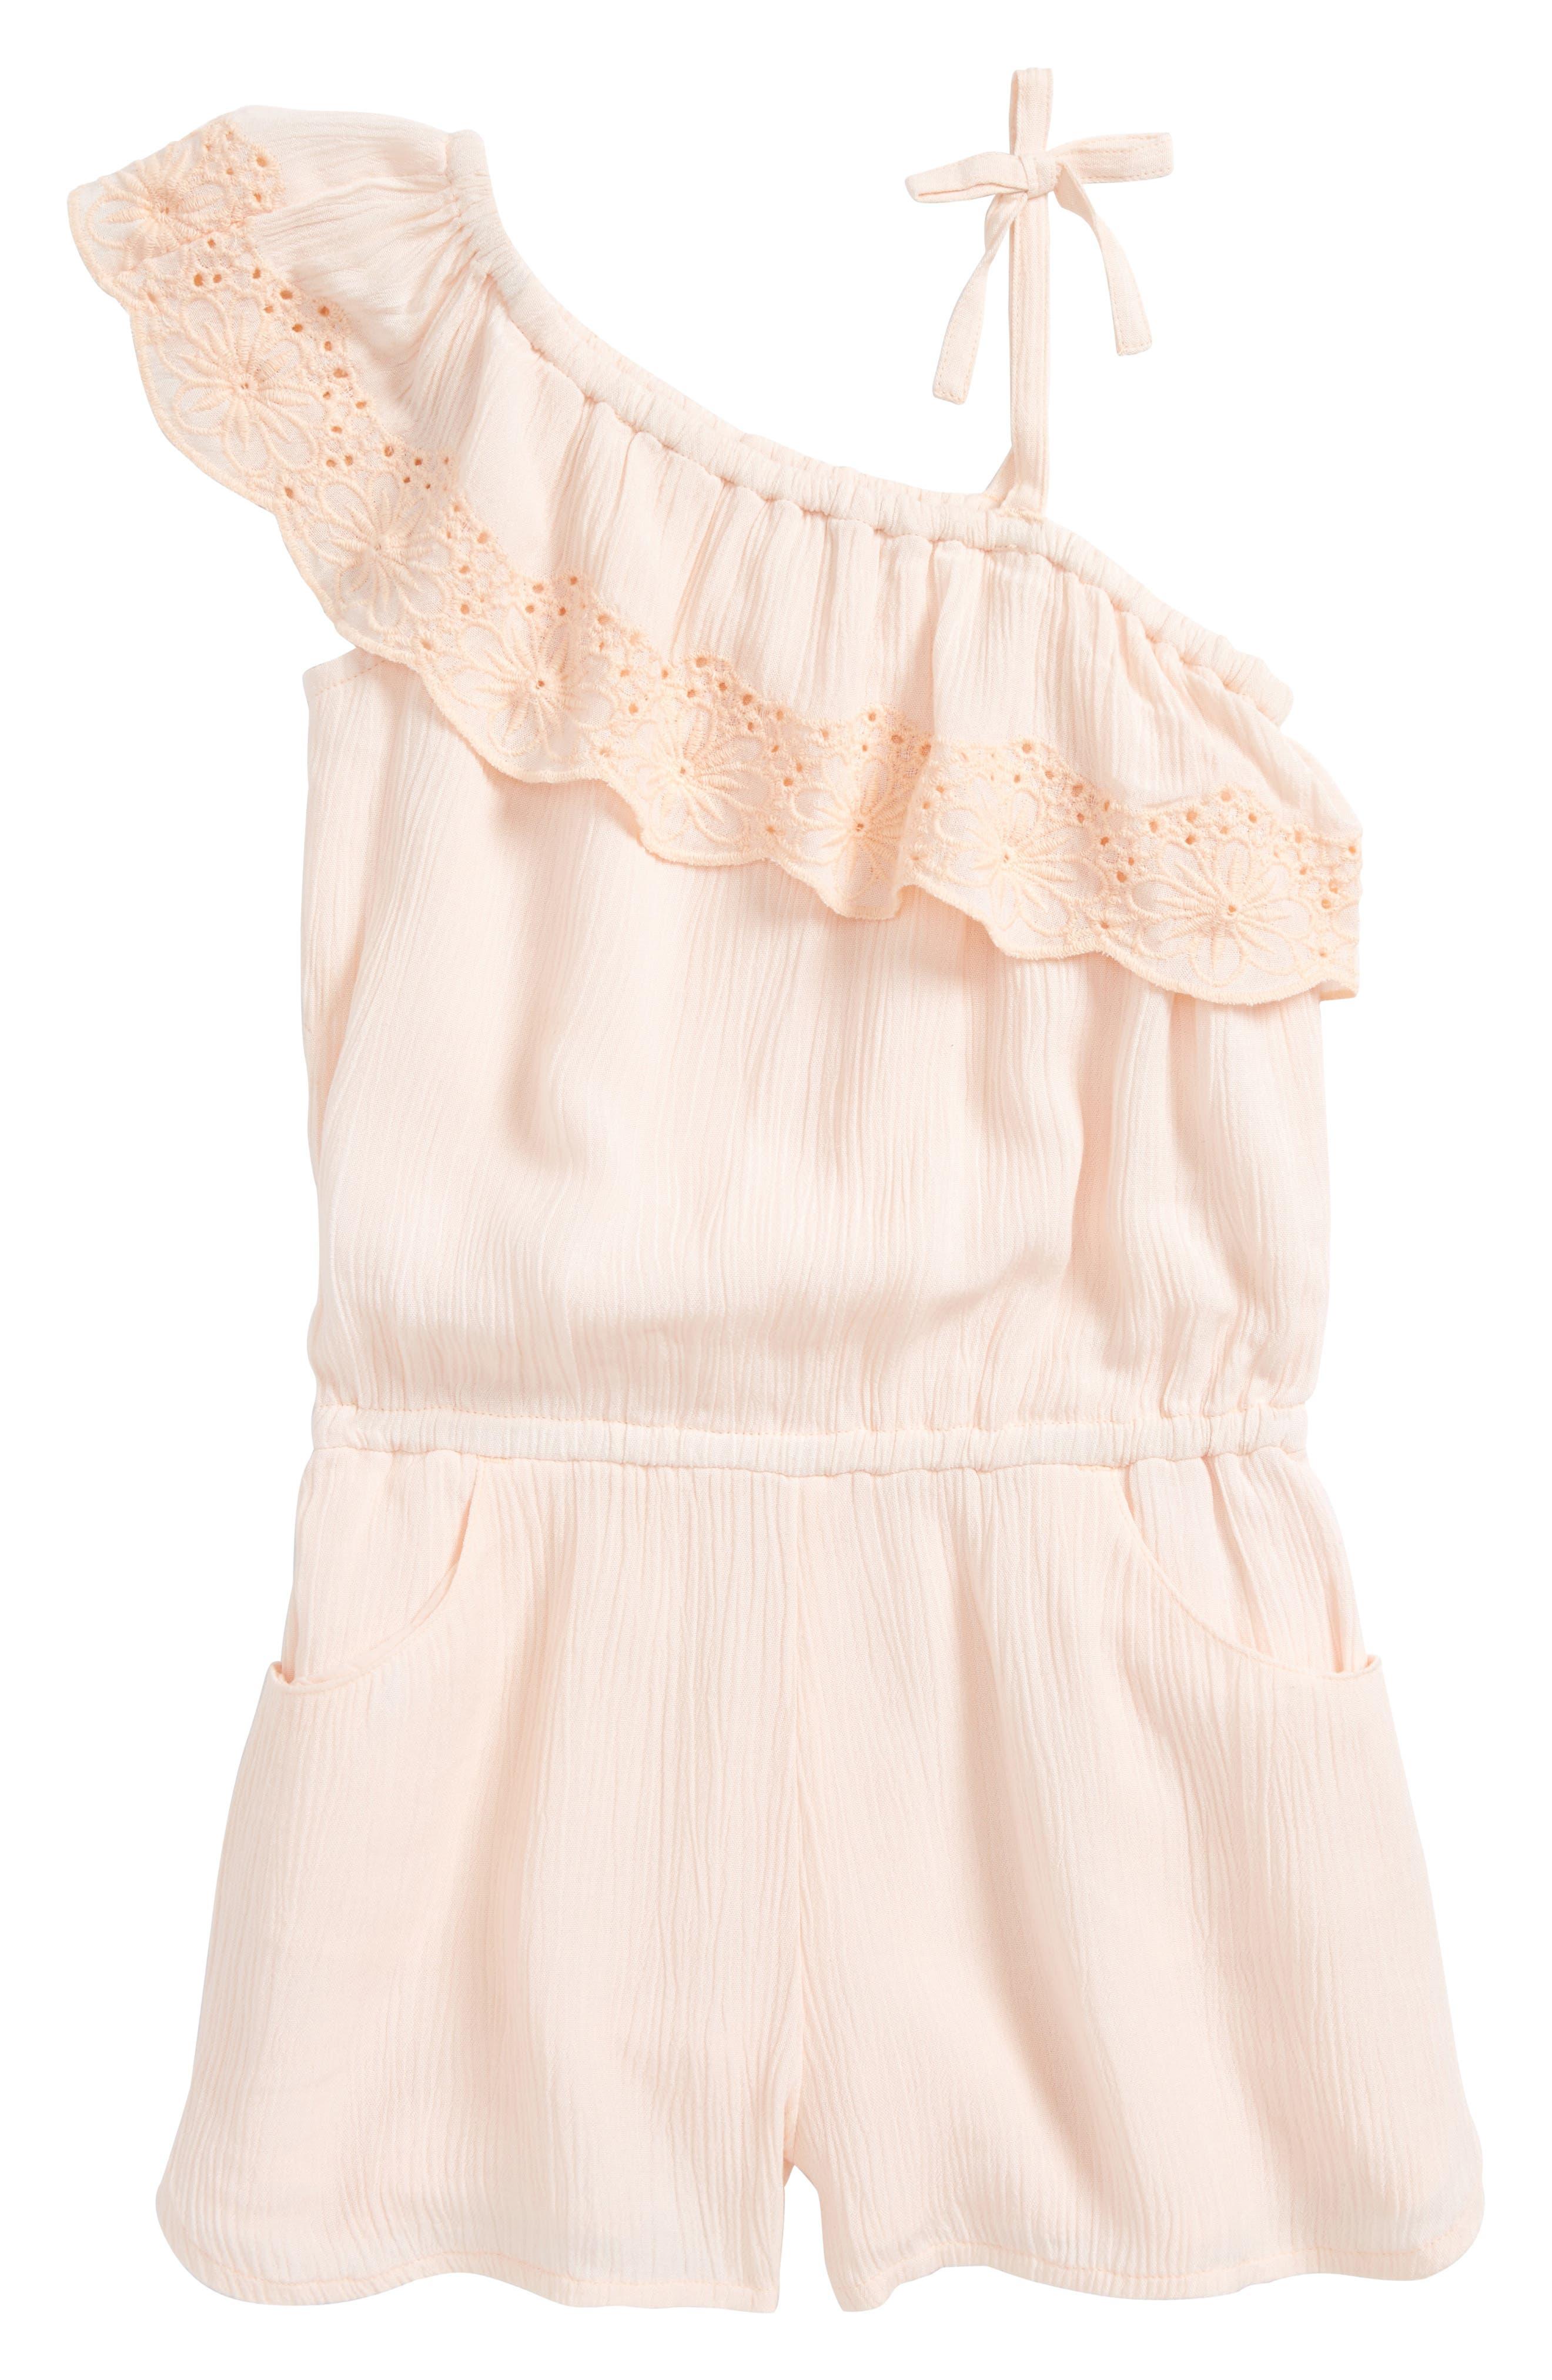 Lanai One-Shoulder Romper,                         Main,                         color, Peach Blush